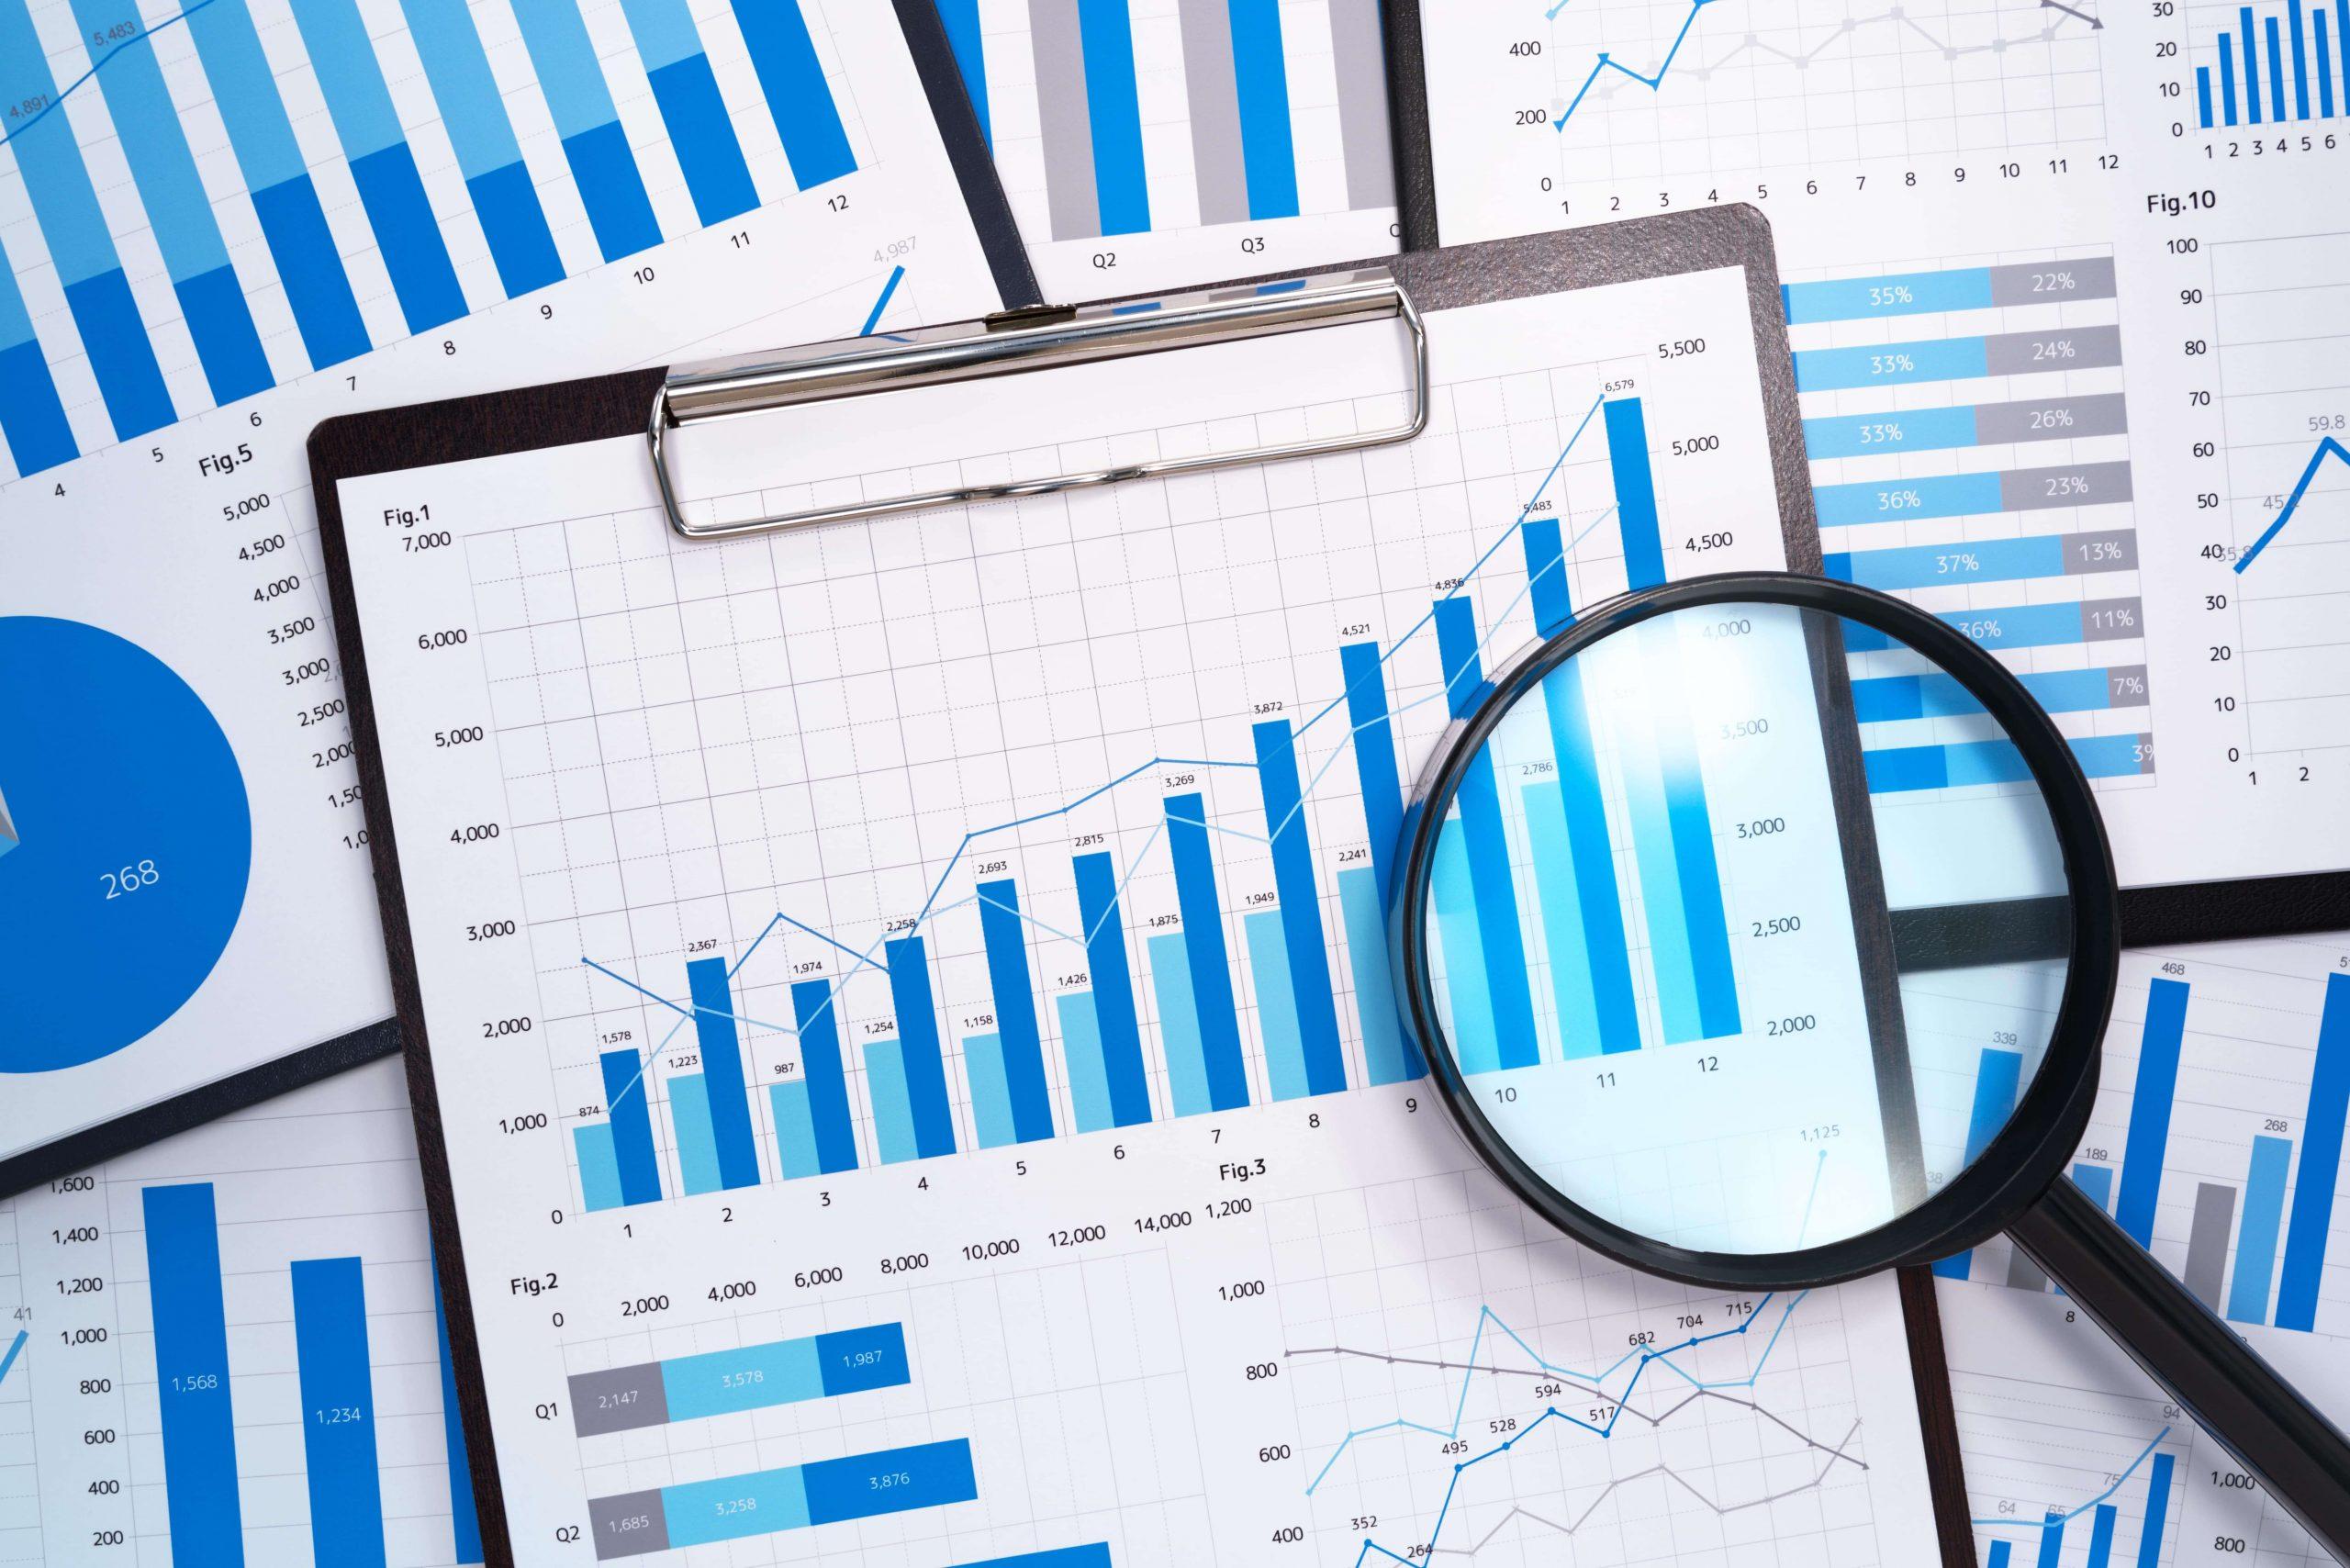 UK Erectile Dysfunction Statistics: How Common is it & Why?